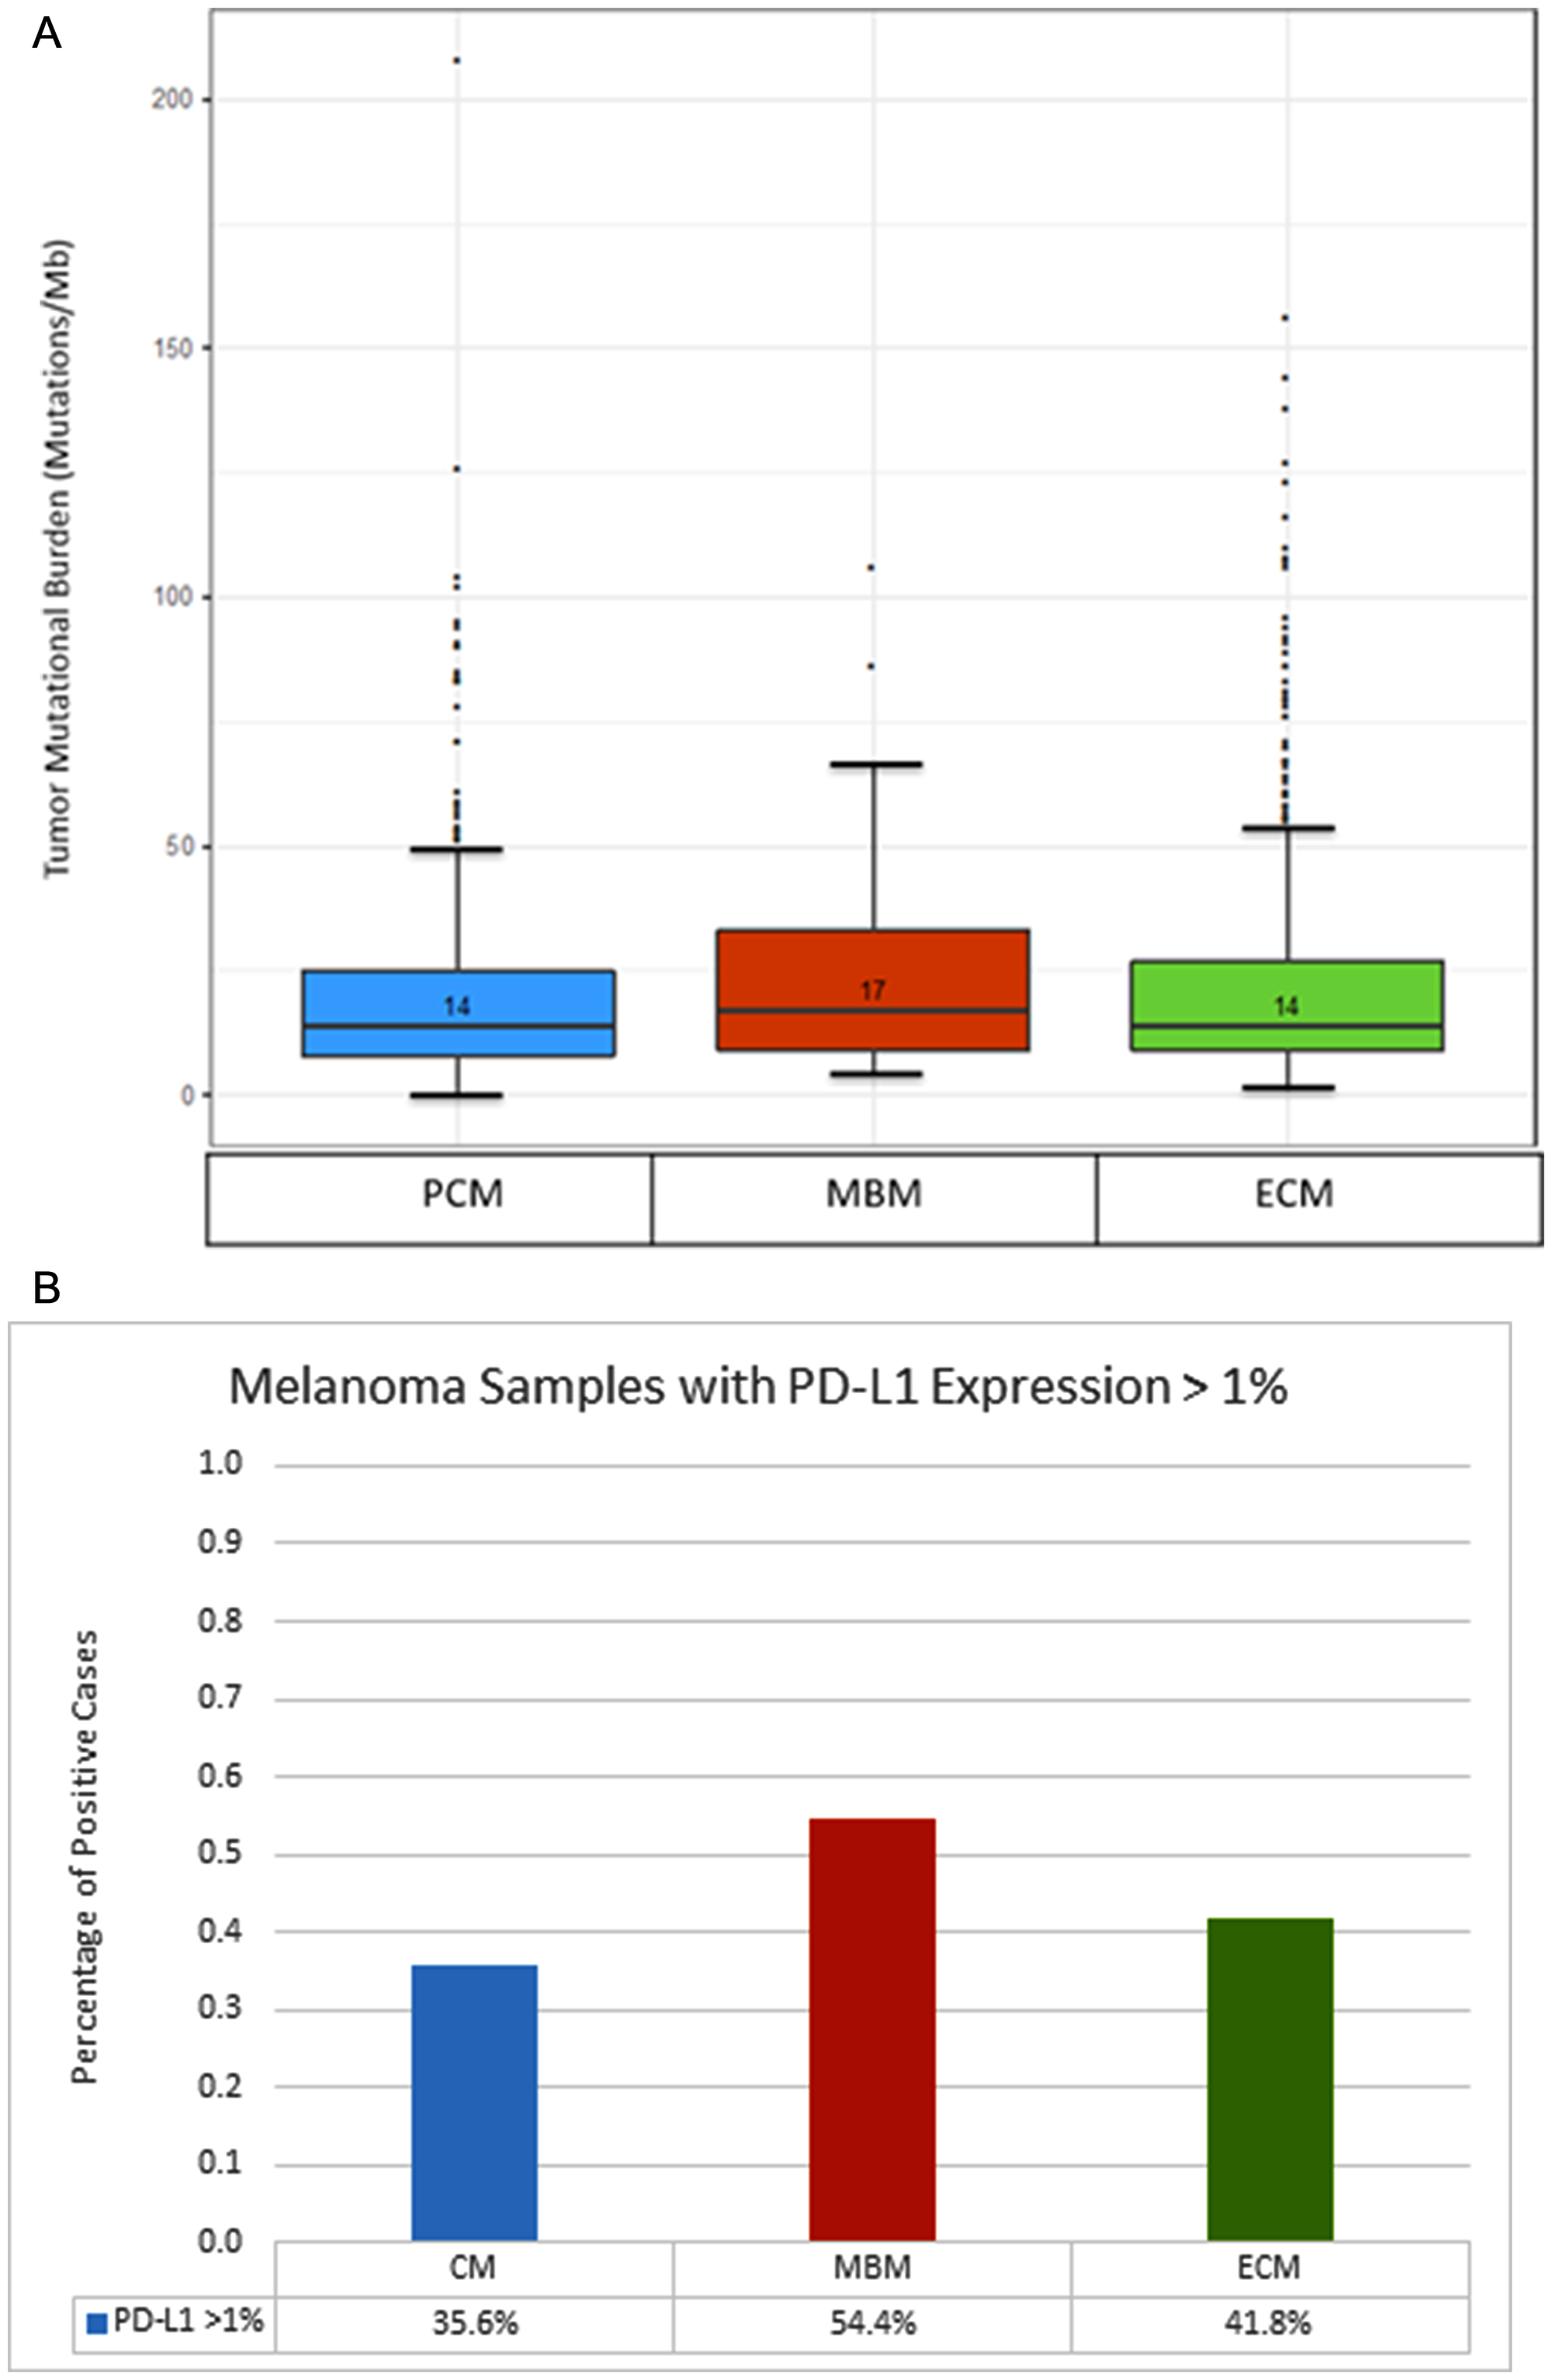 Comparison of tumor mutational burden and PD-L1 expression between primary cutaneous melanoma (PCM), melanoma brain metastases (MBM) and extracranial metastases (ECM).